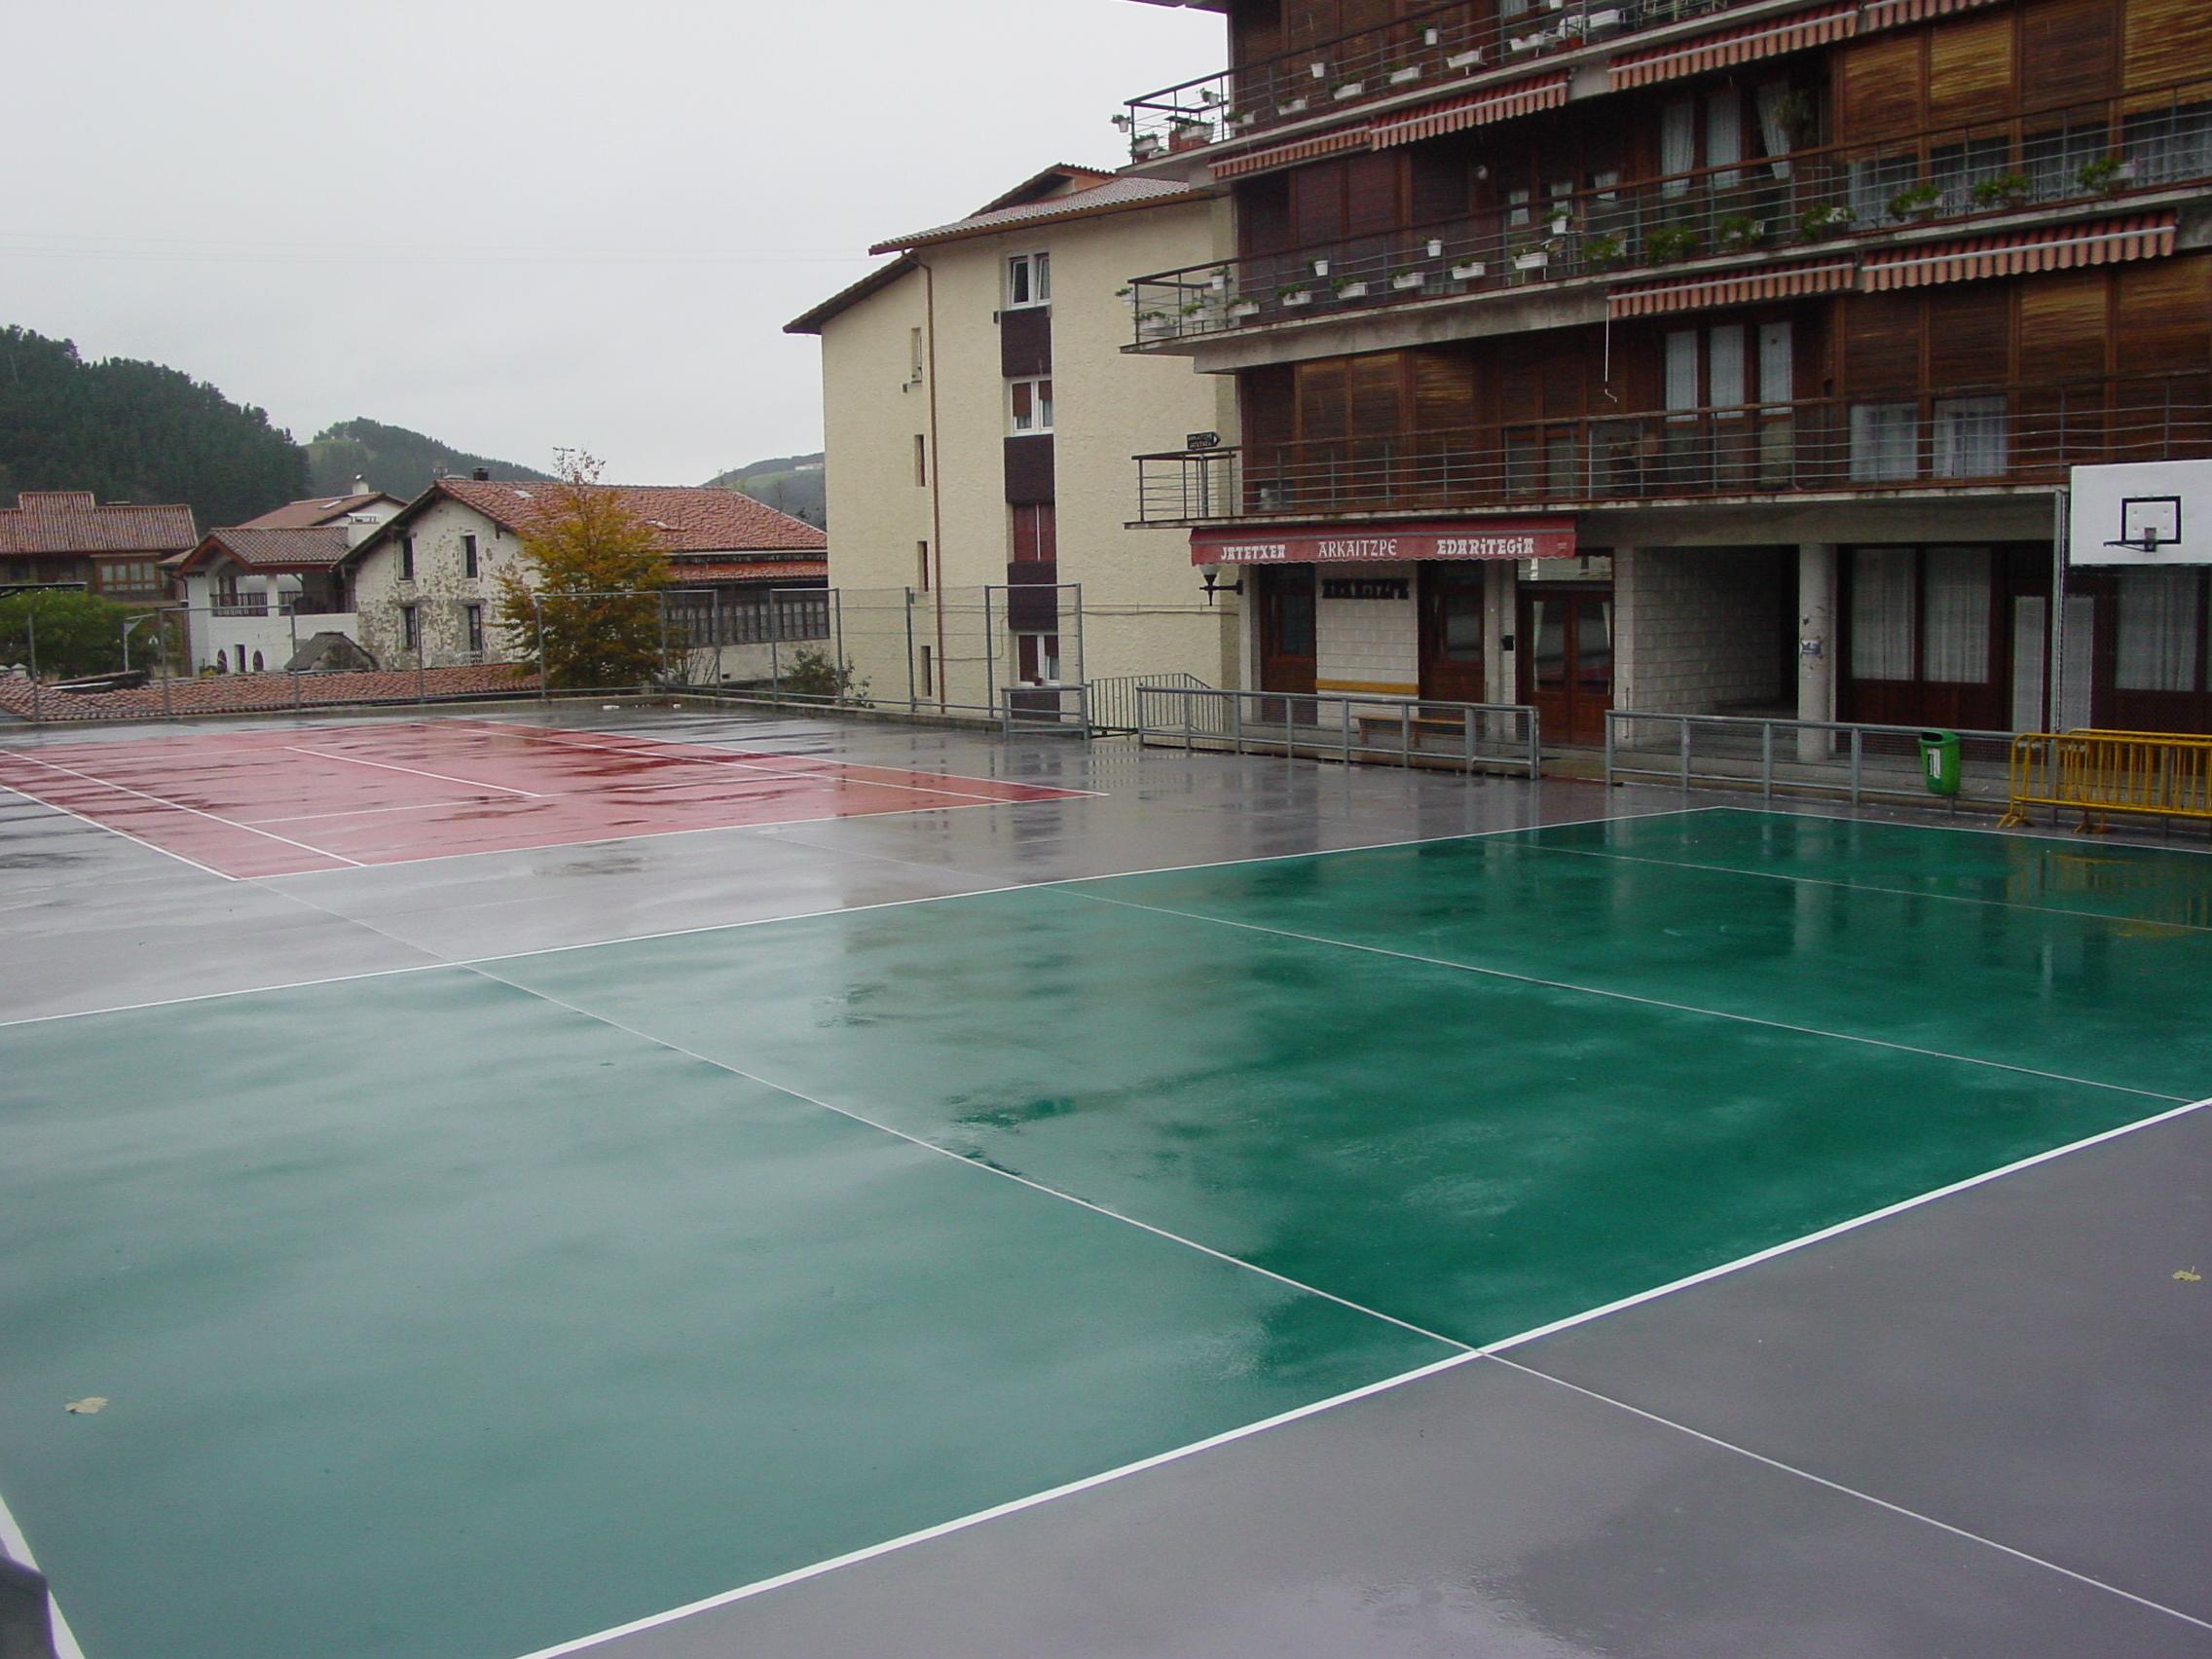 Impermeabilizar una cubierta transitable kemag pavimentos for Impermeabilizar terraza transitable